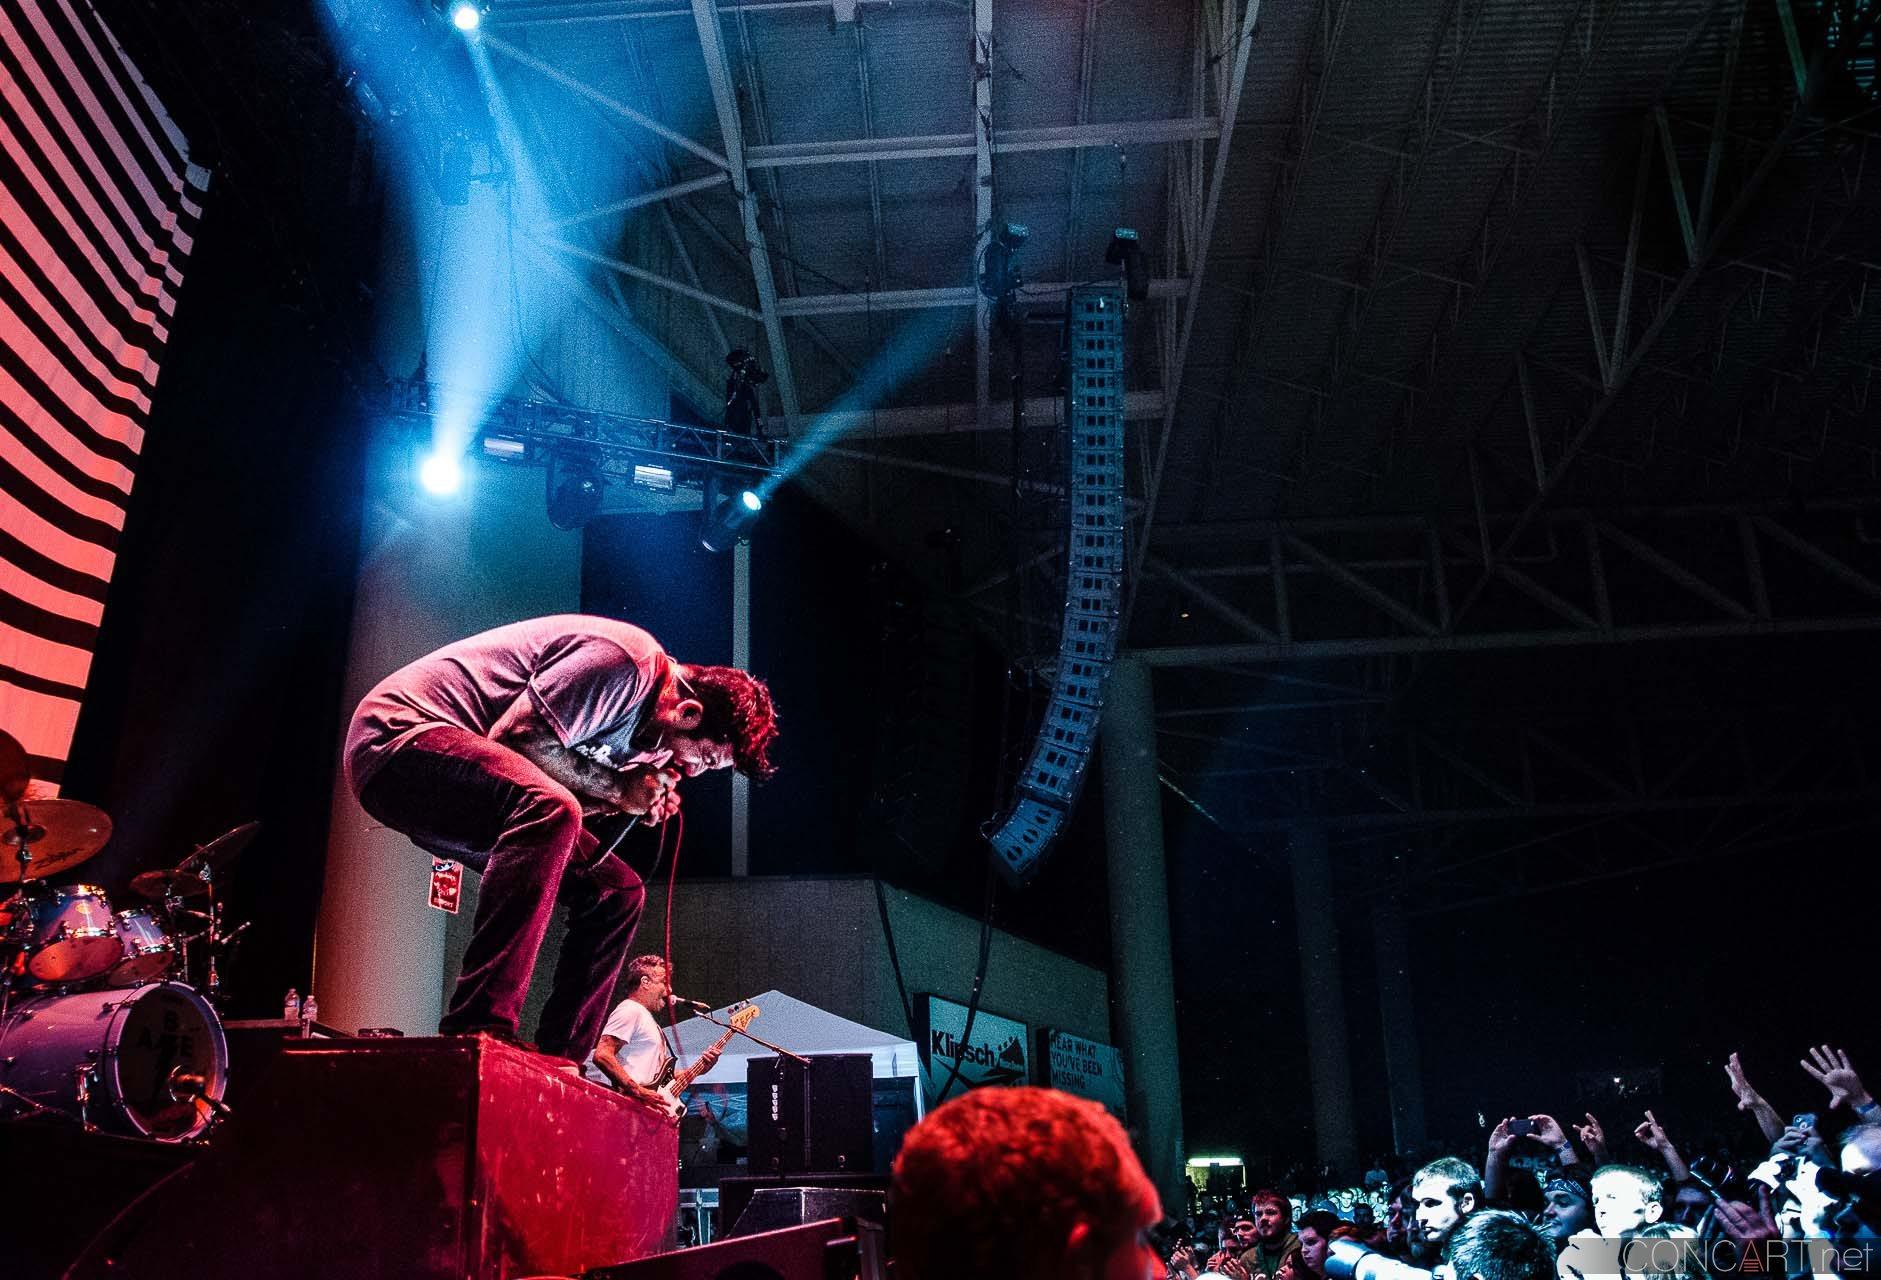 deftones_live_klipsch_music_center_indianapolis_2013-01